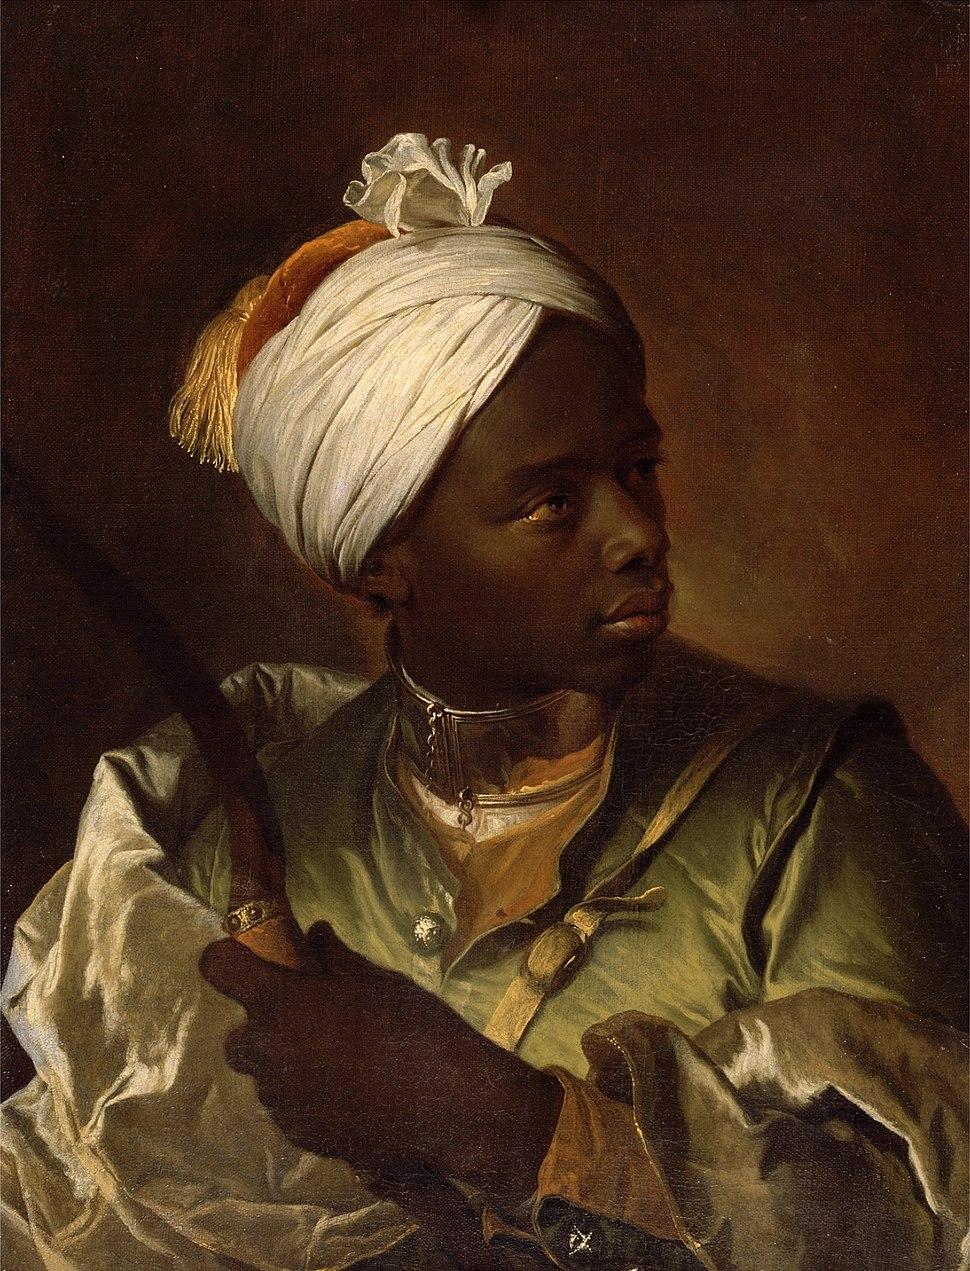 Hyacinthe Rigaud - Jeune nègre avec un arc (ca.1697)